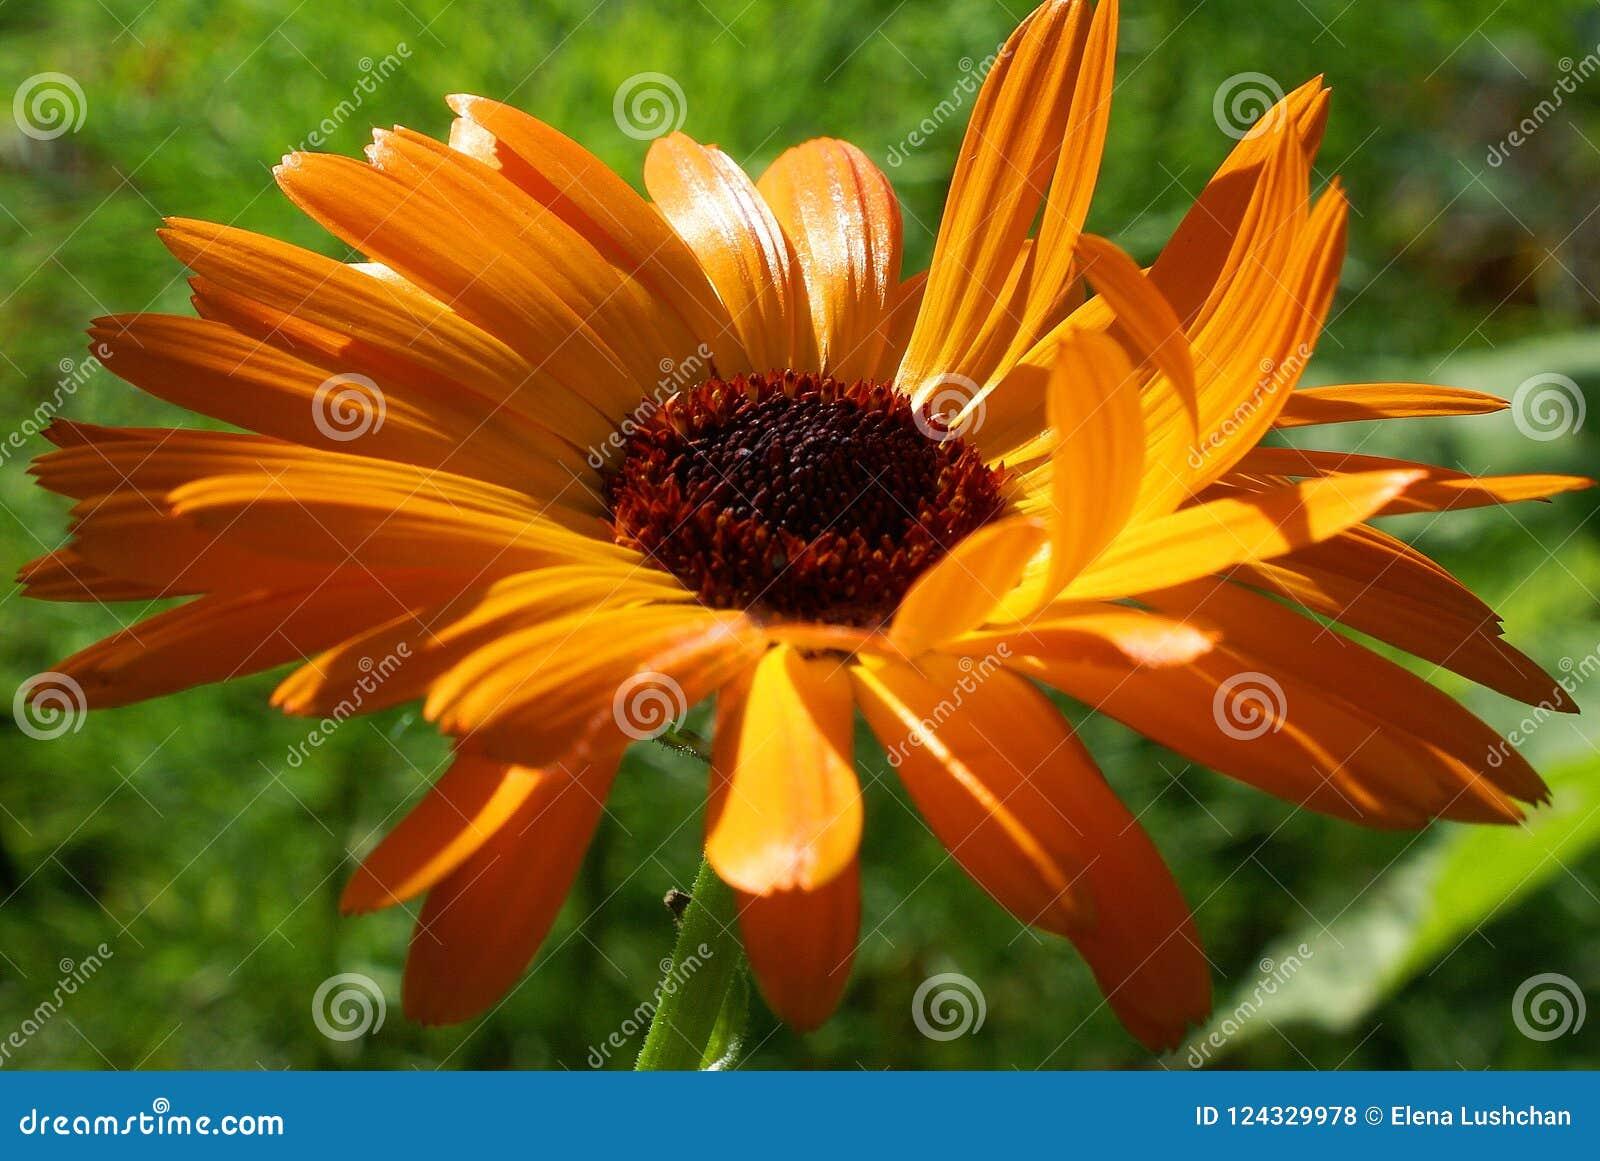 5b30de0c9 Beautiful calendula flower bright orange, ornamental plant, green  background.